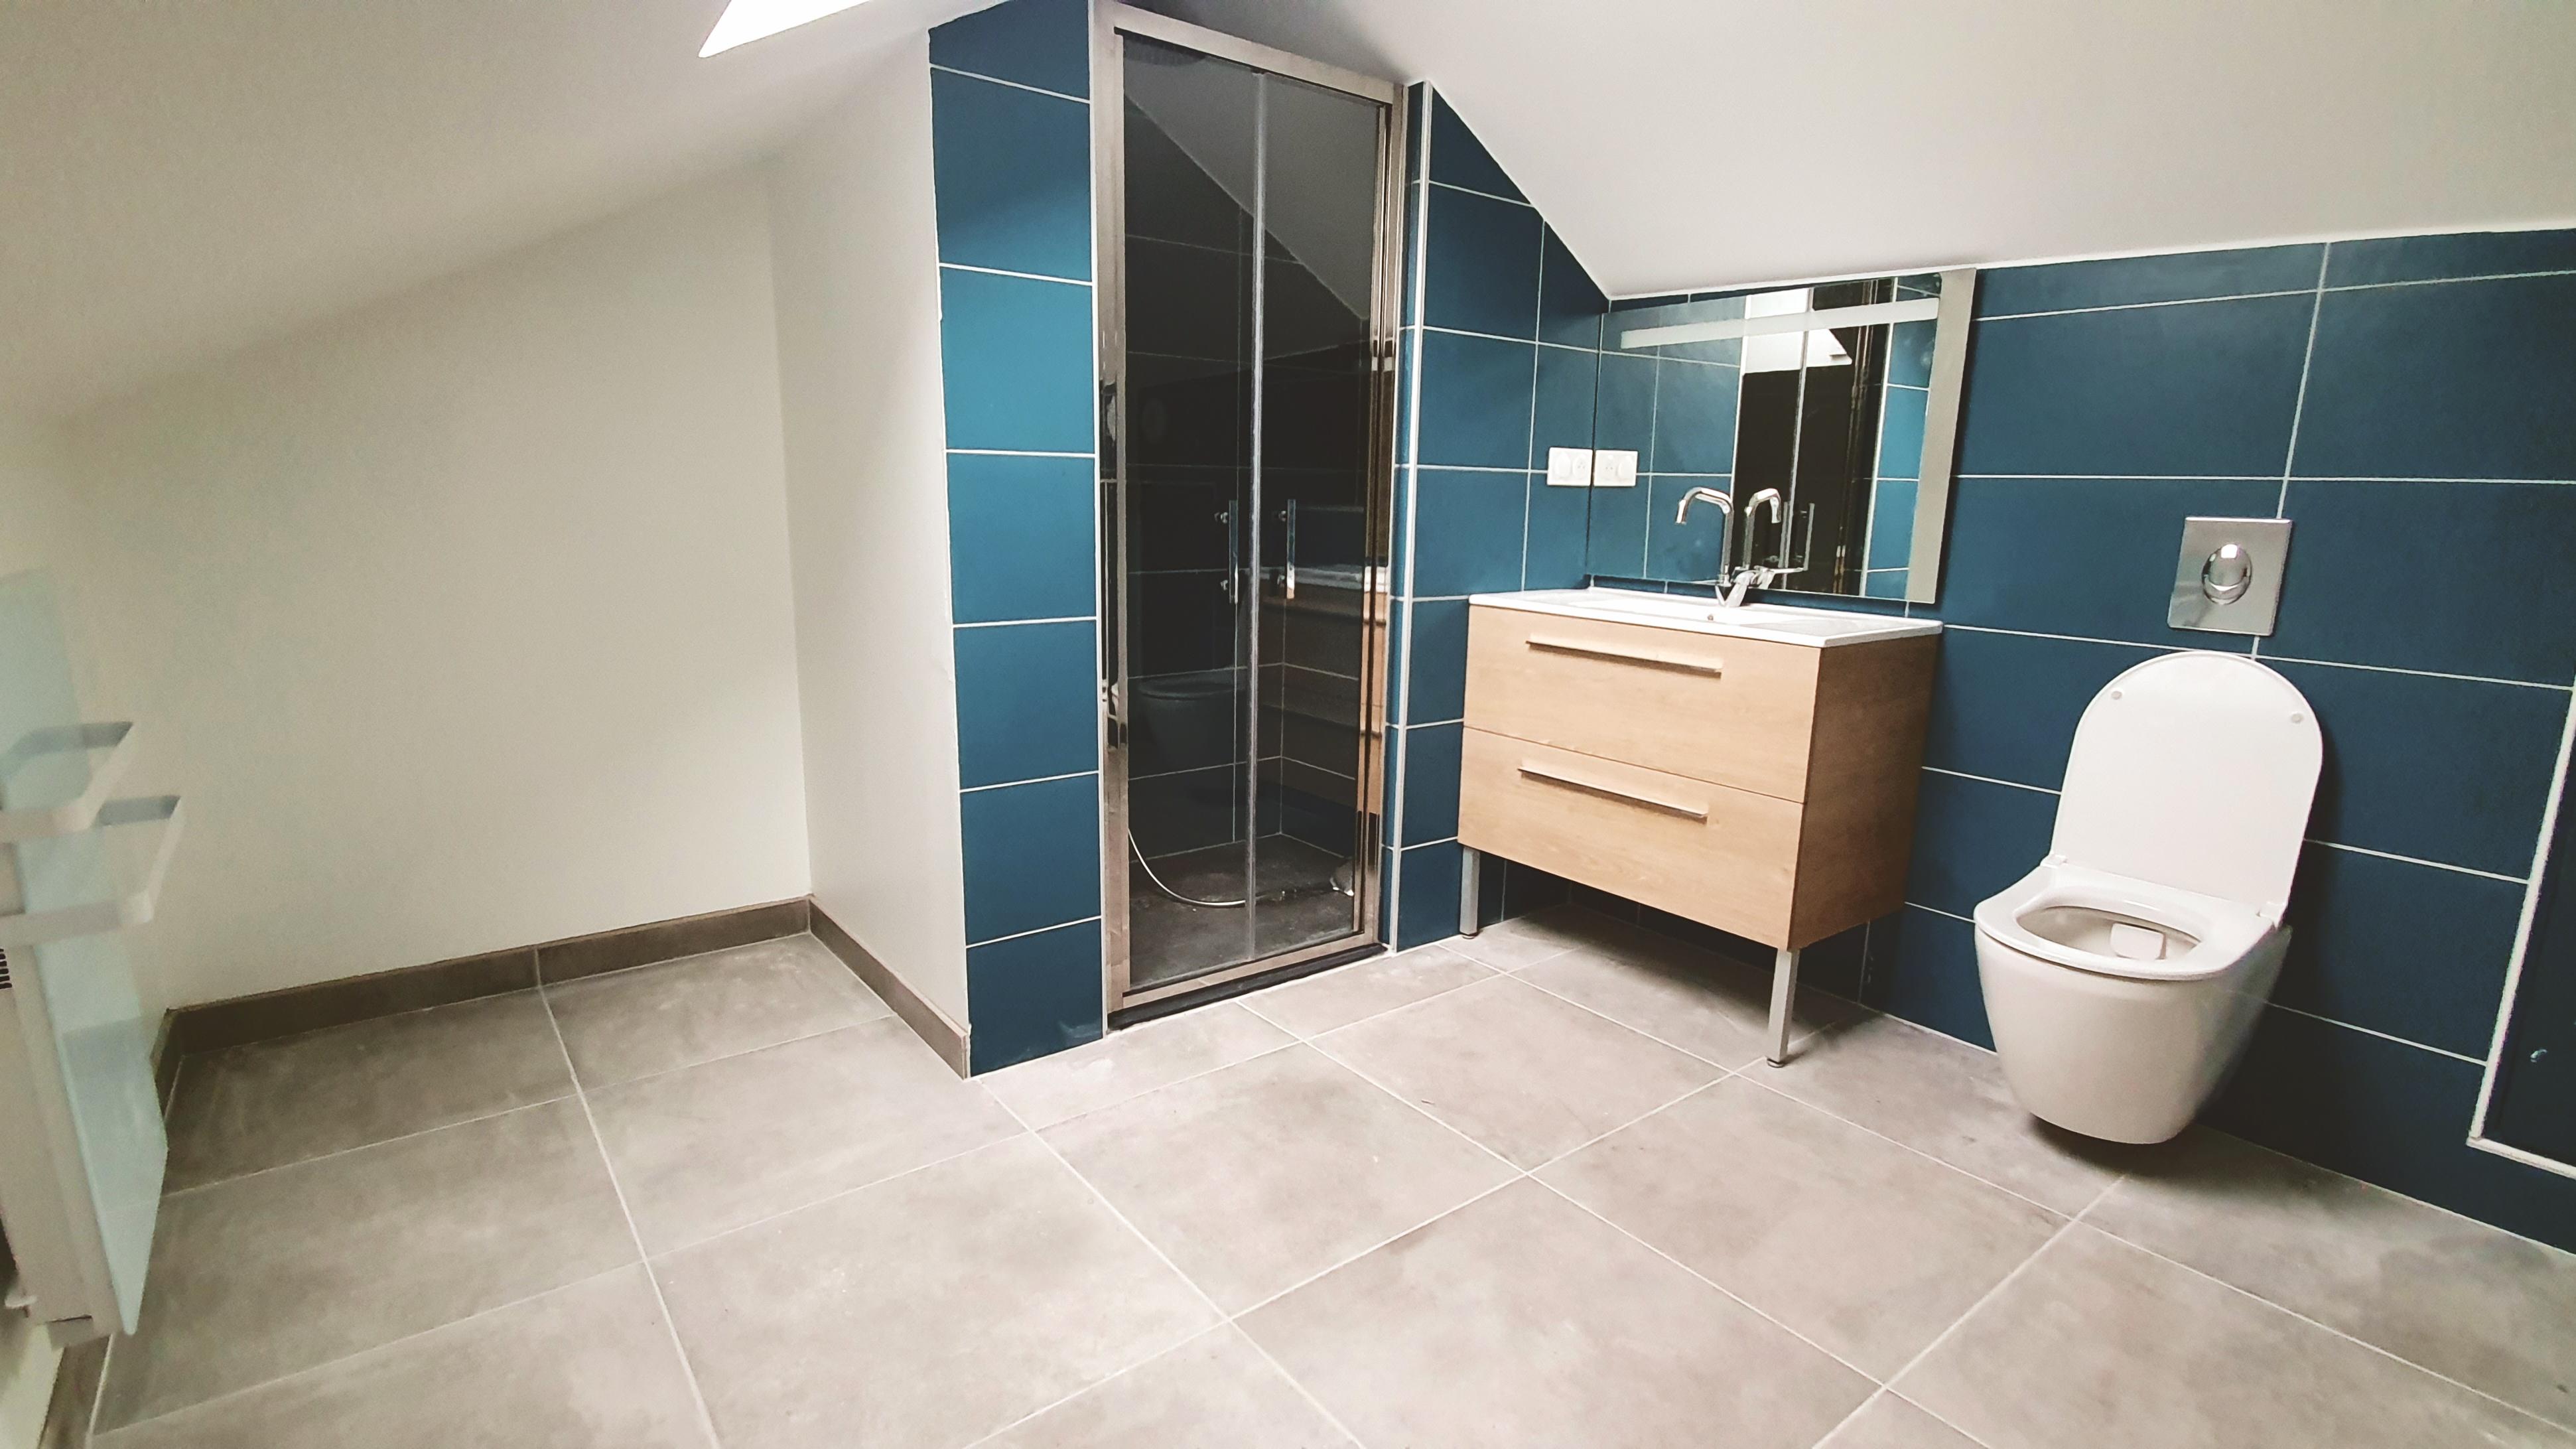 Salle de douche chambre 7 faience bleue